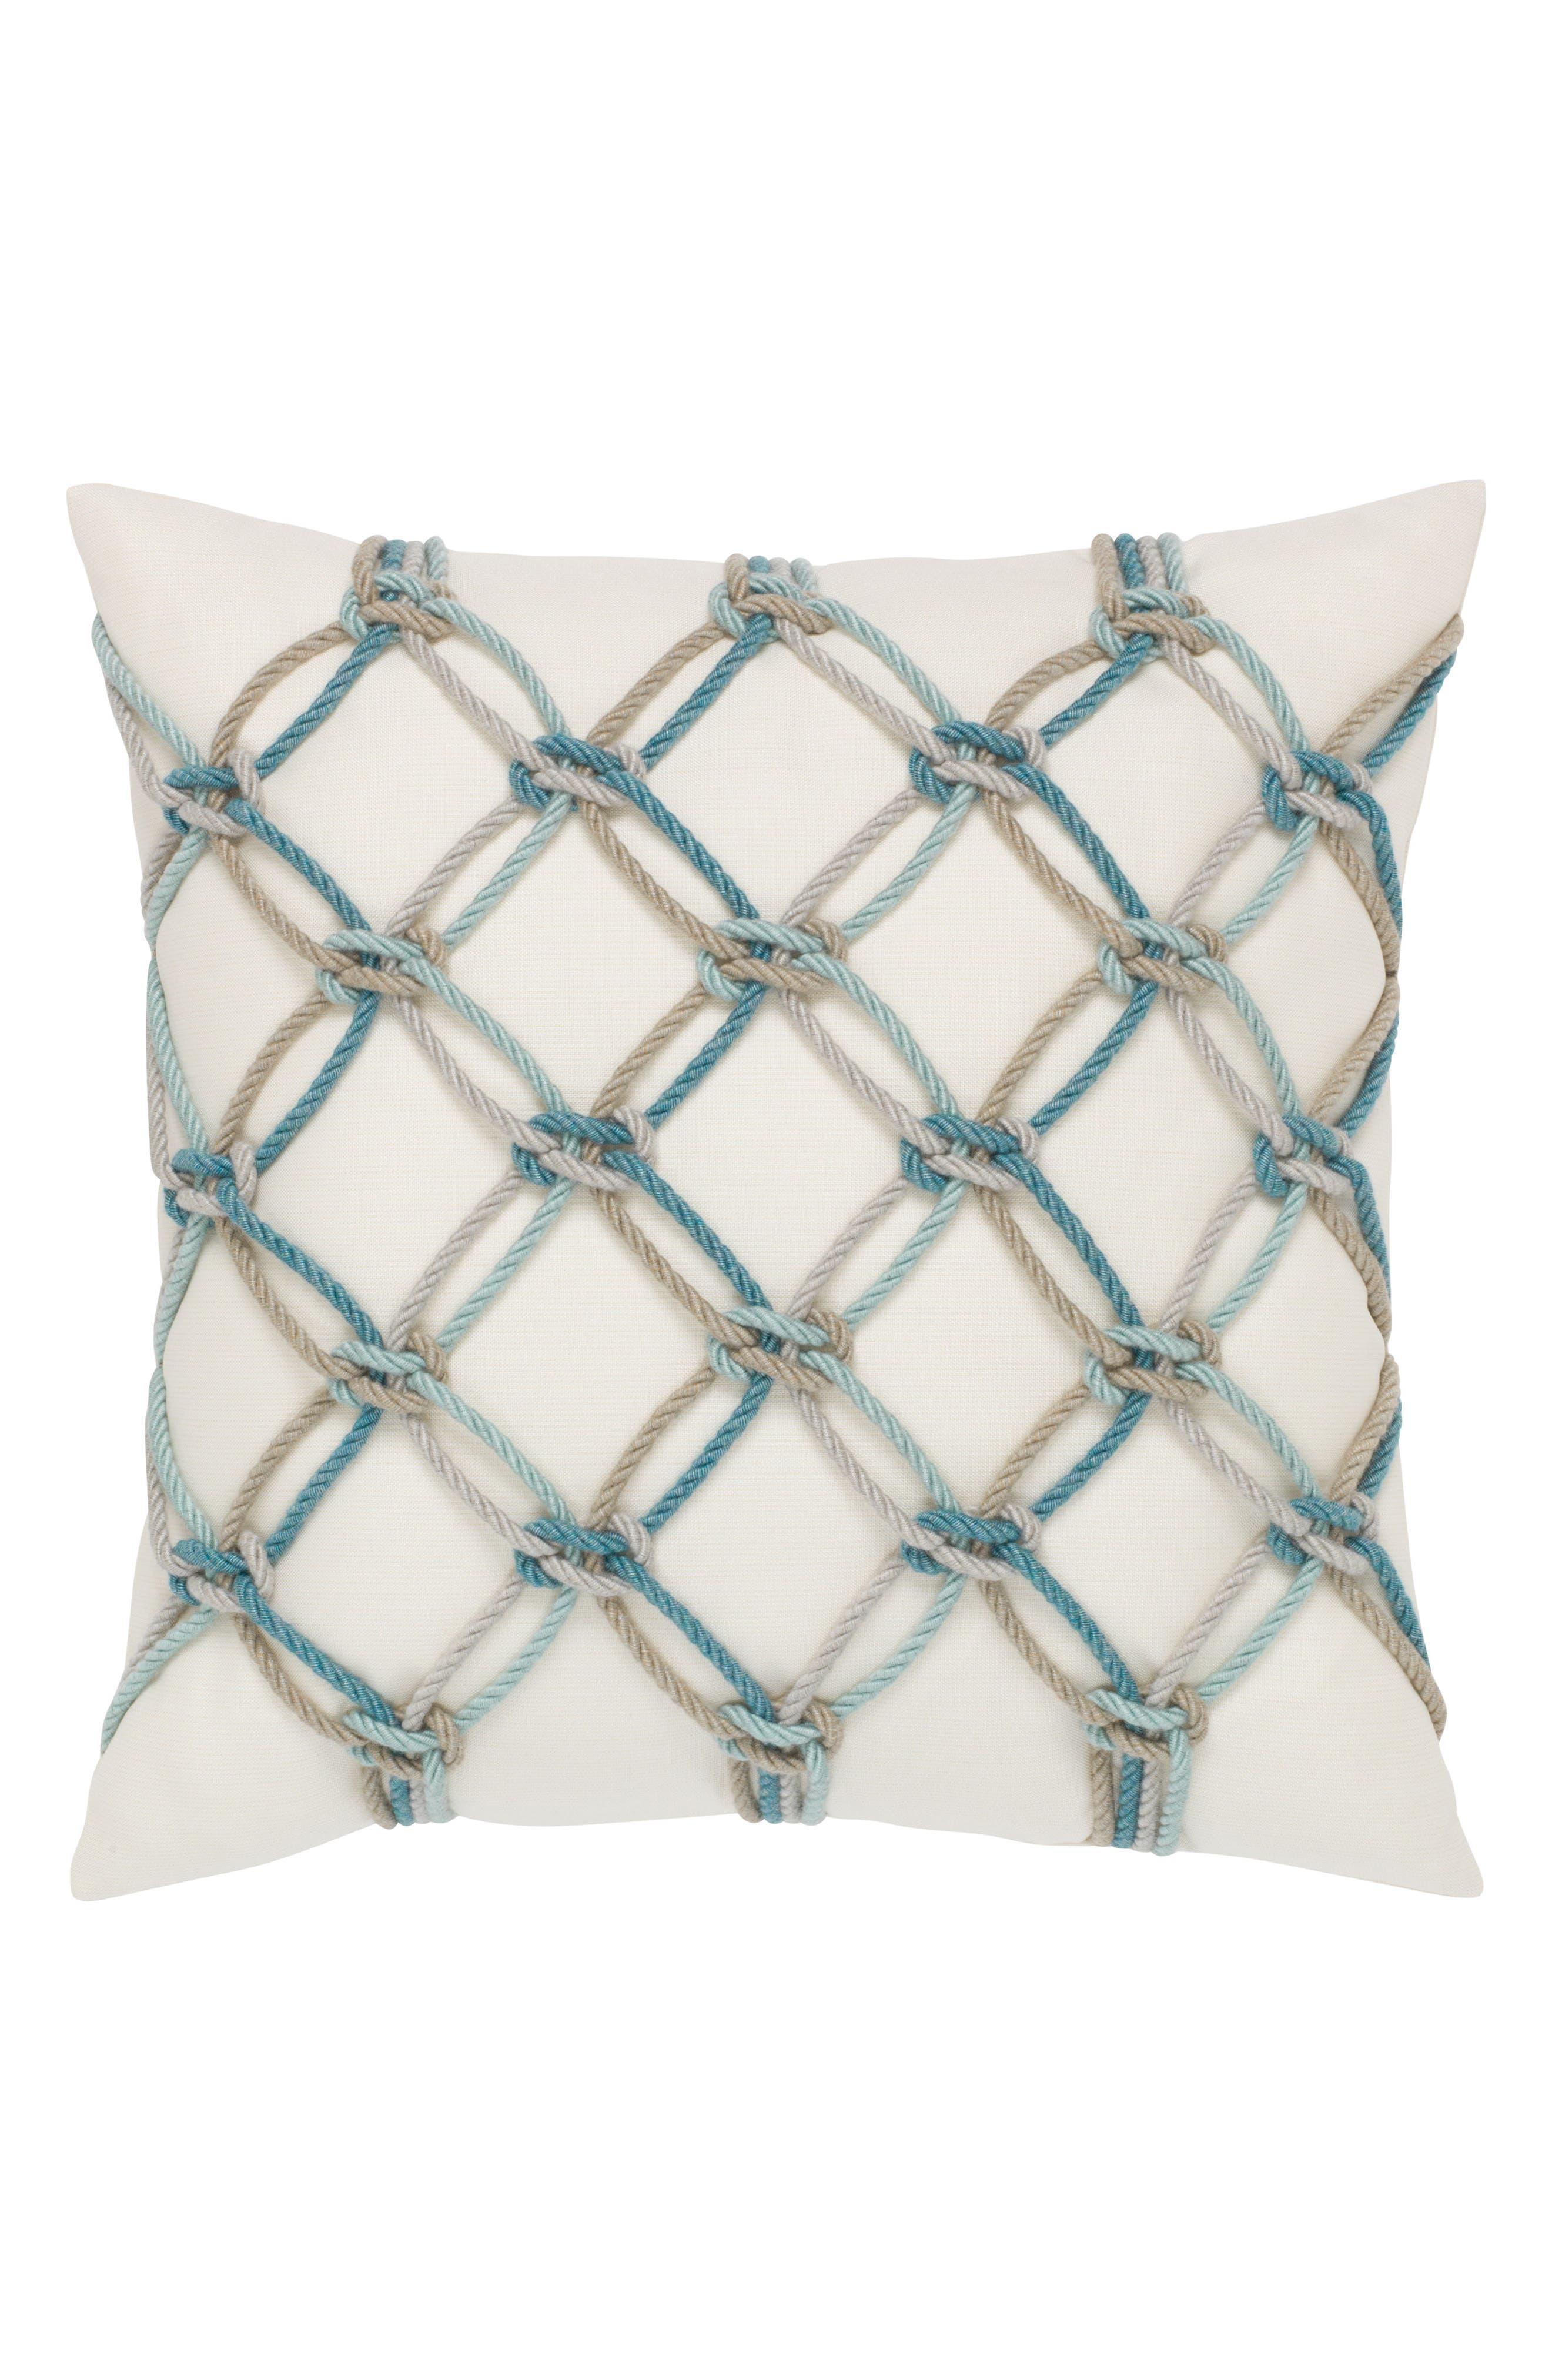 Elaine Smith Aqua Rope Indoor/Outdoor Accent Pillow